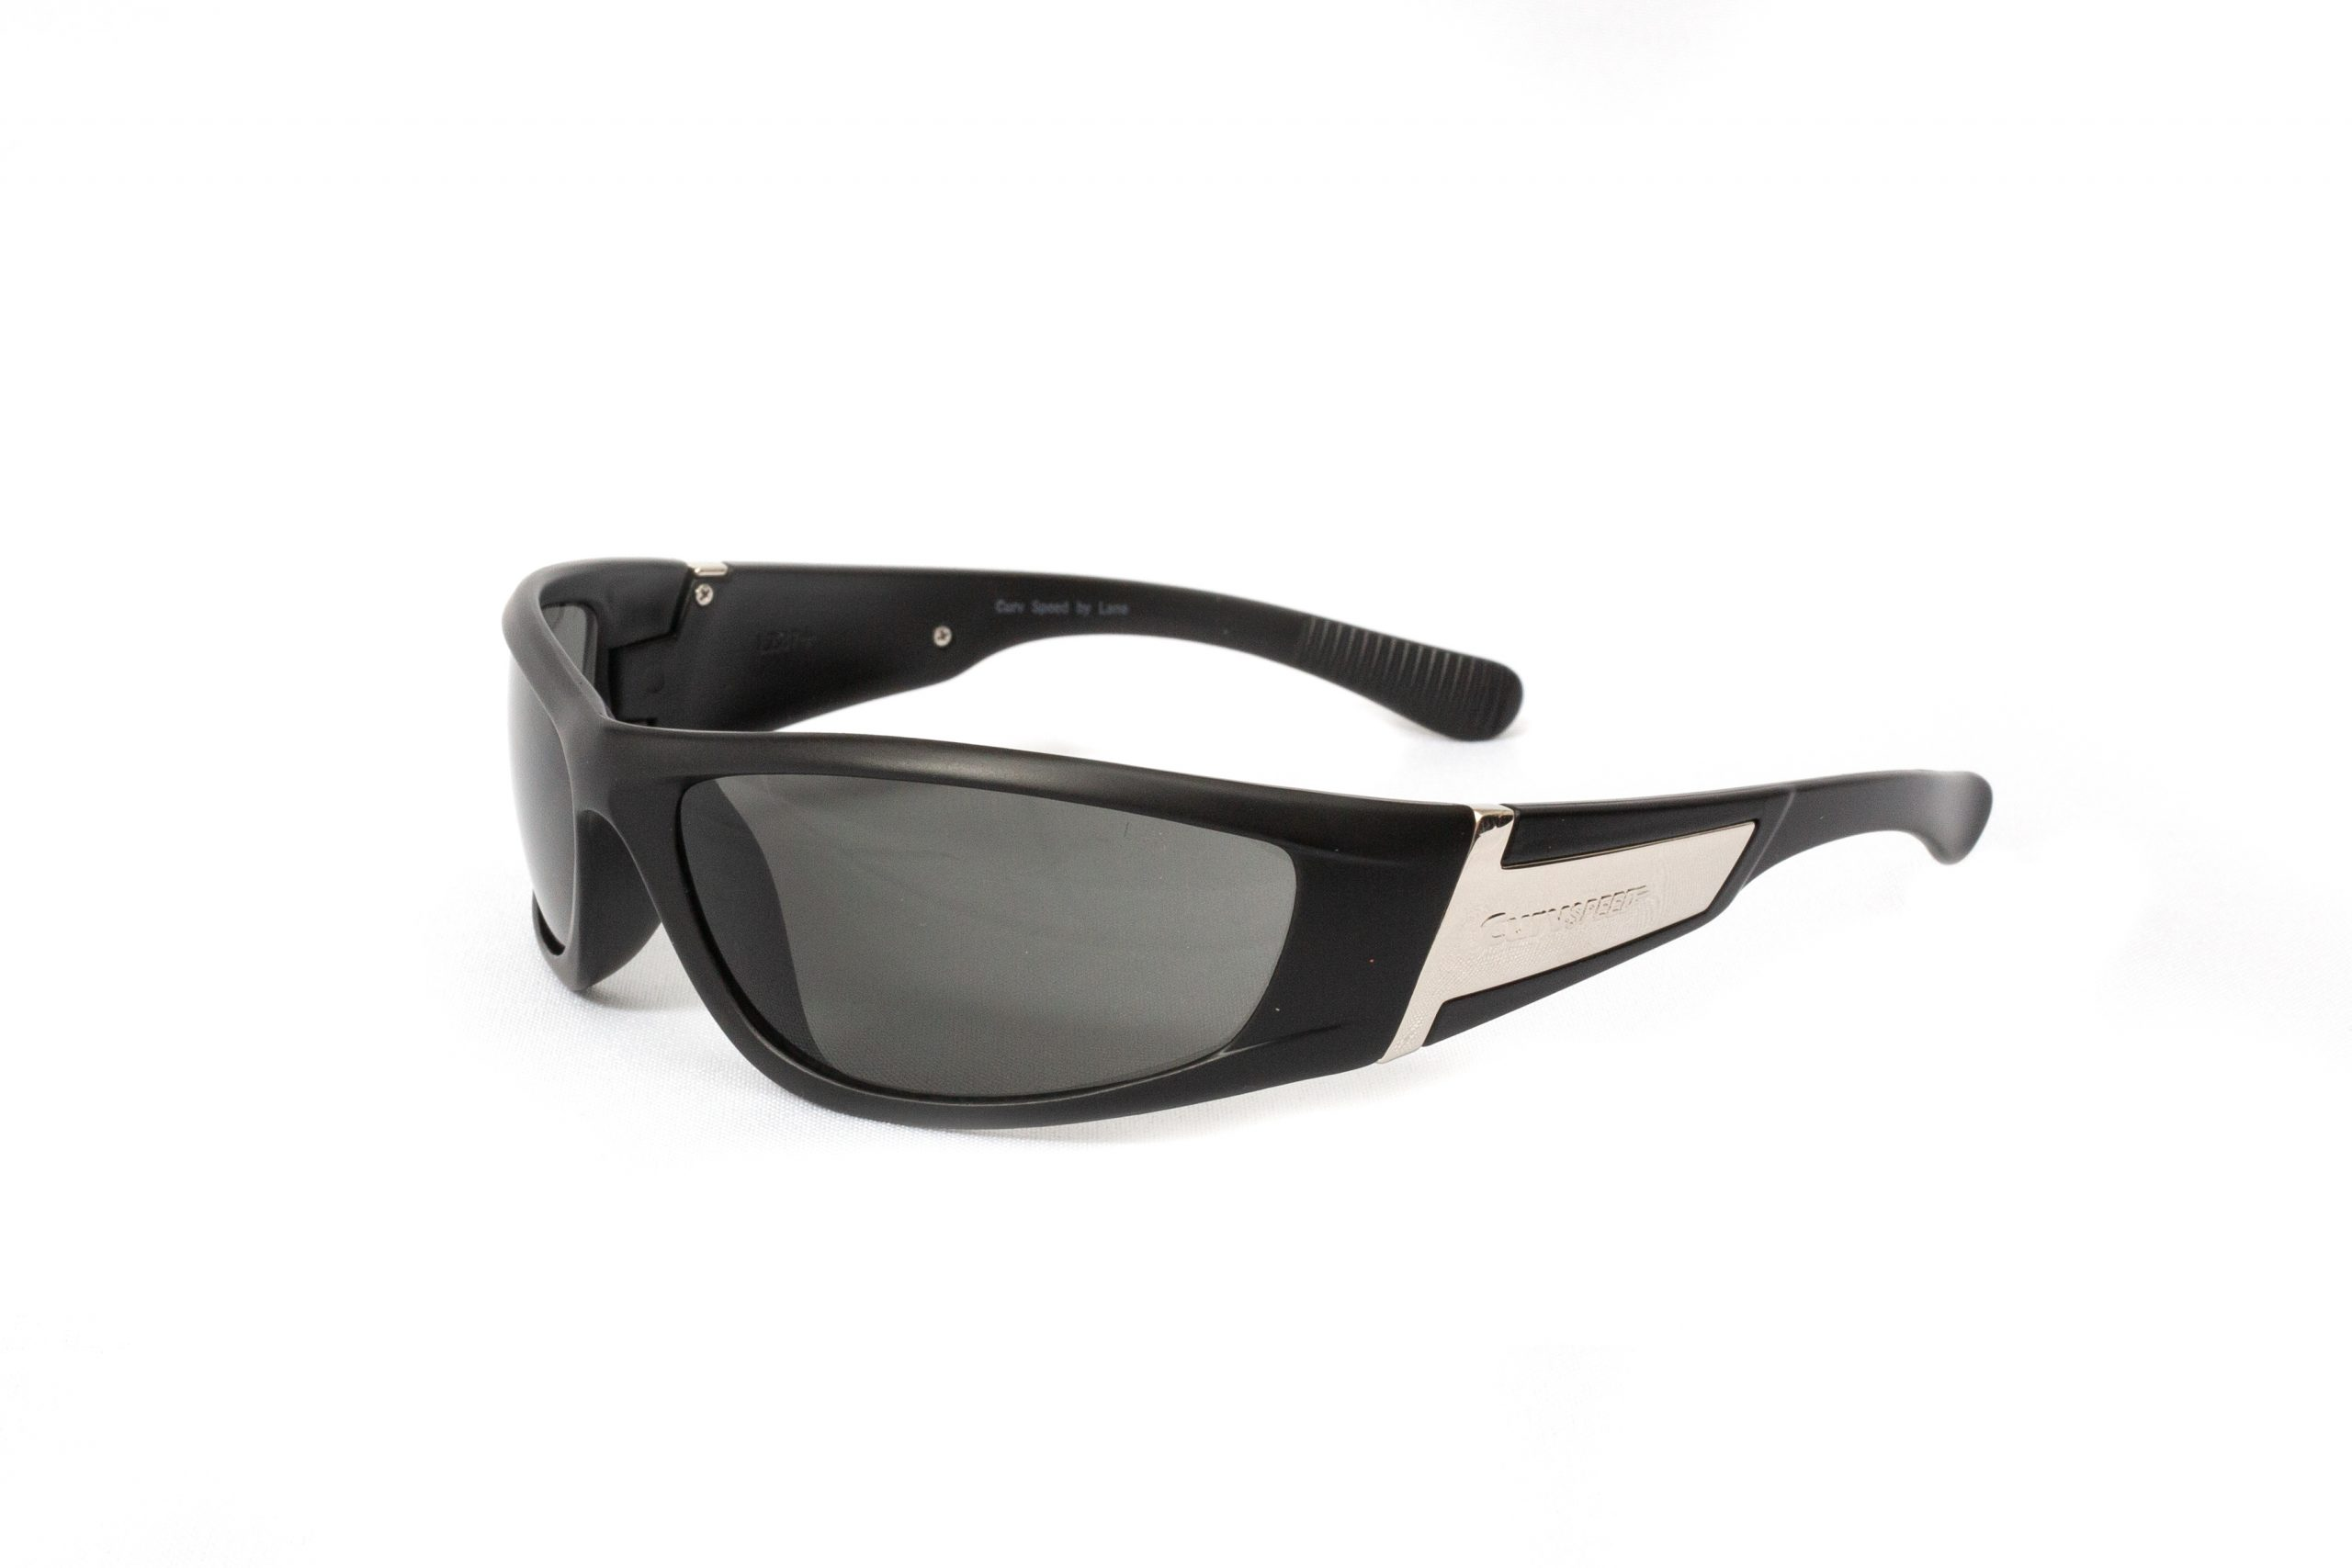 01-35M Curv Speed Matte Sunglasses